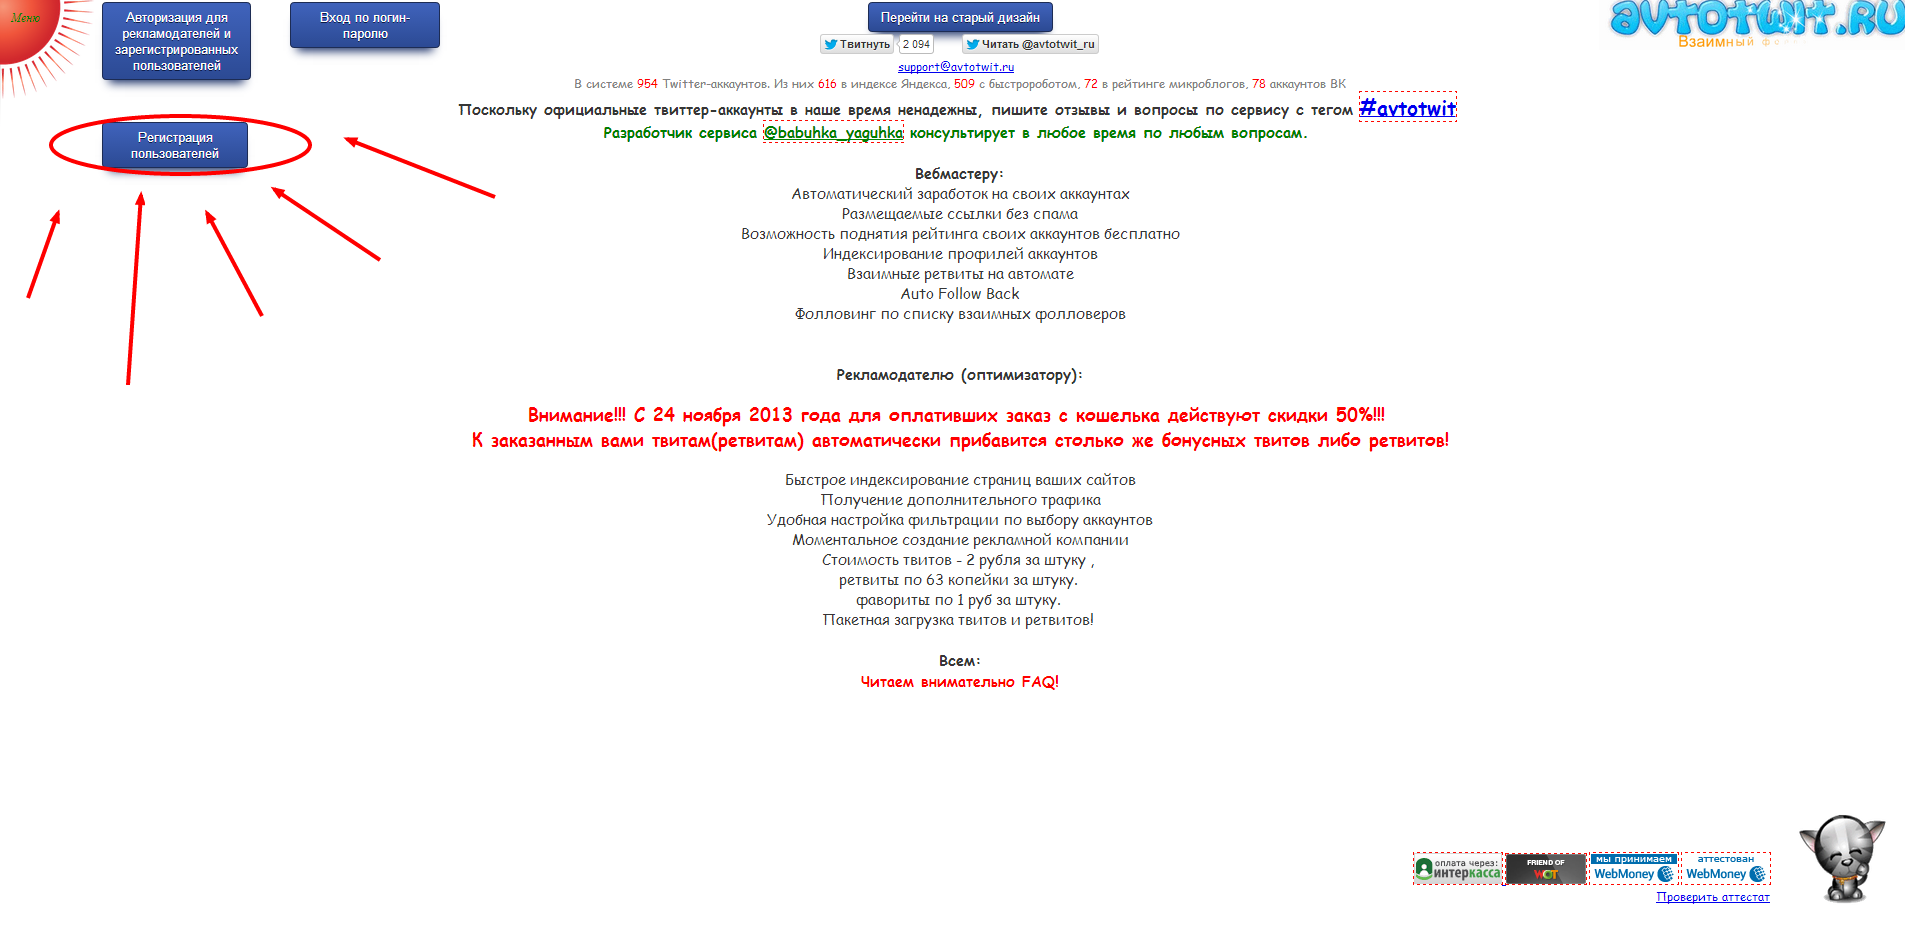 Регистрация в avtotwit